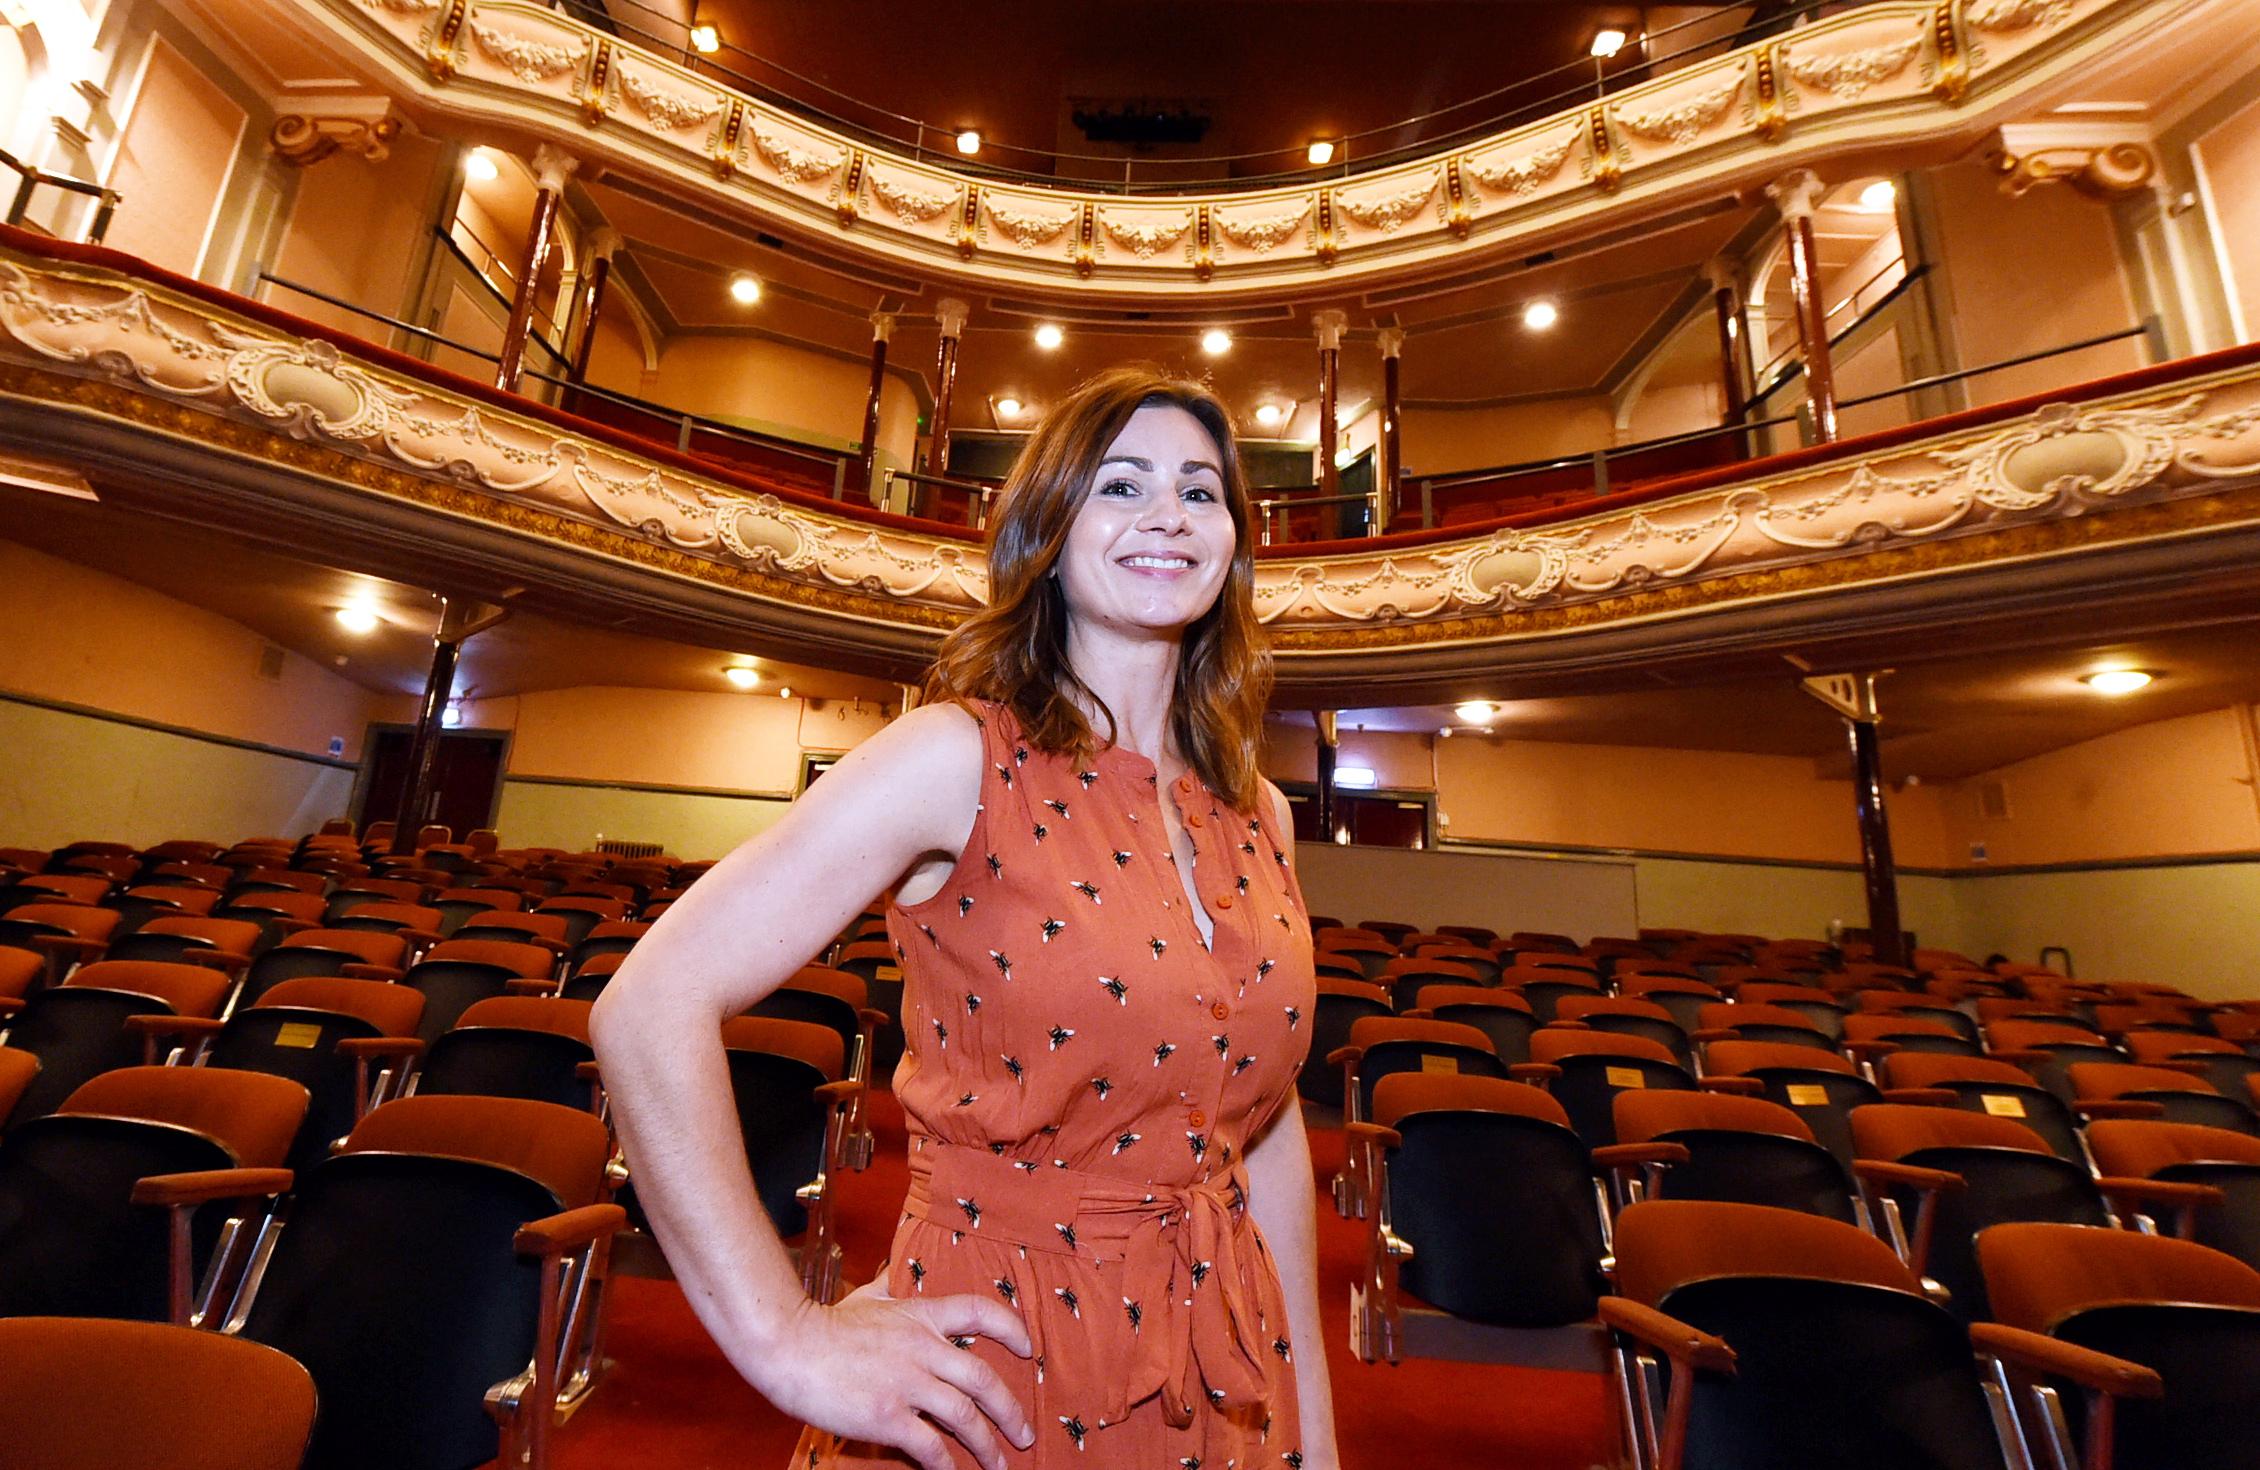 Christina Camillo from the Tivoli Theatre